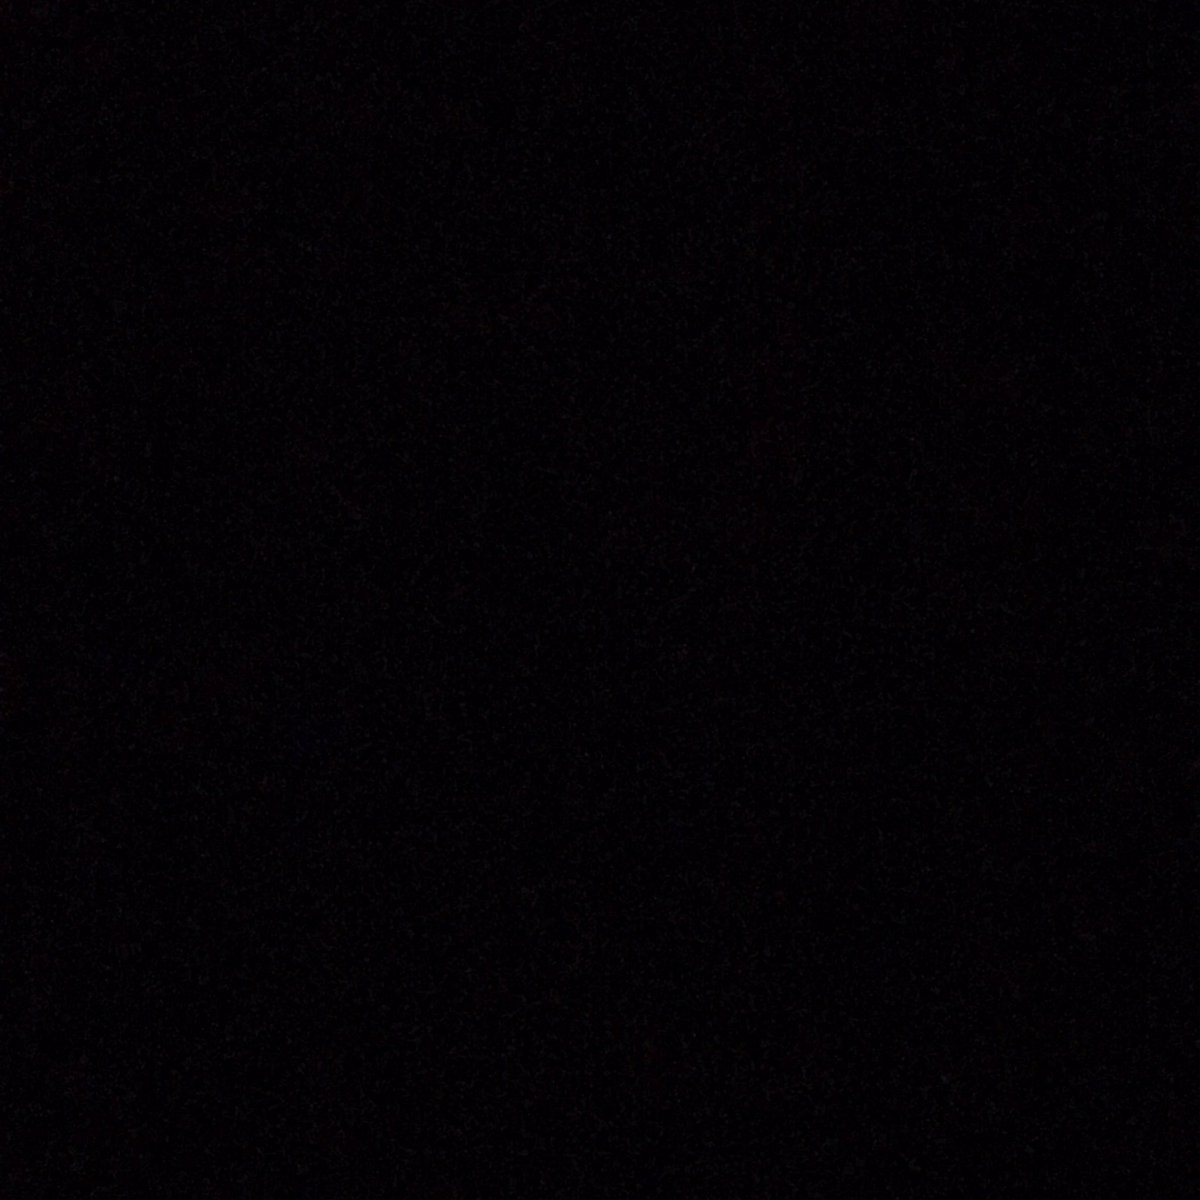 #BlackOutTuesday #BlackLivesMatter